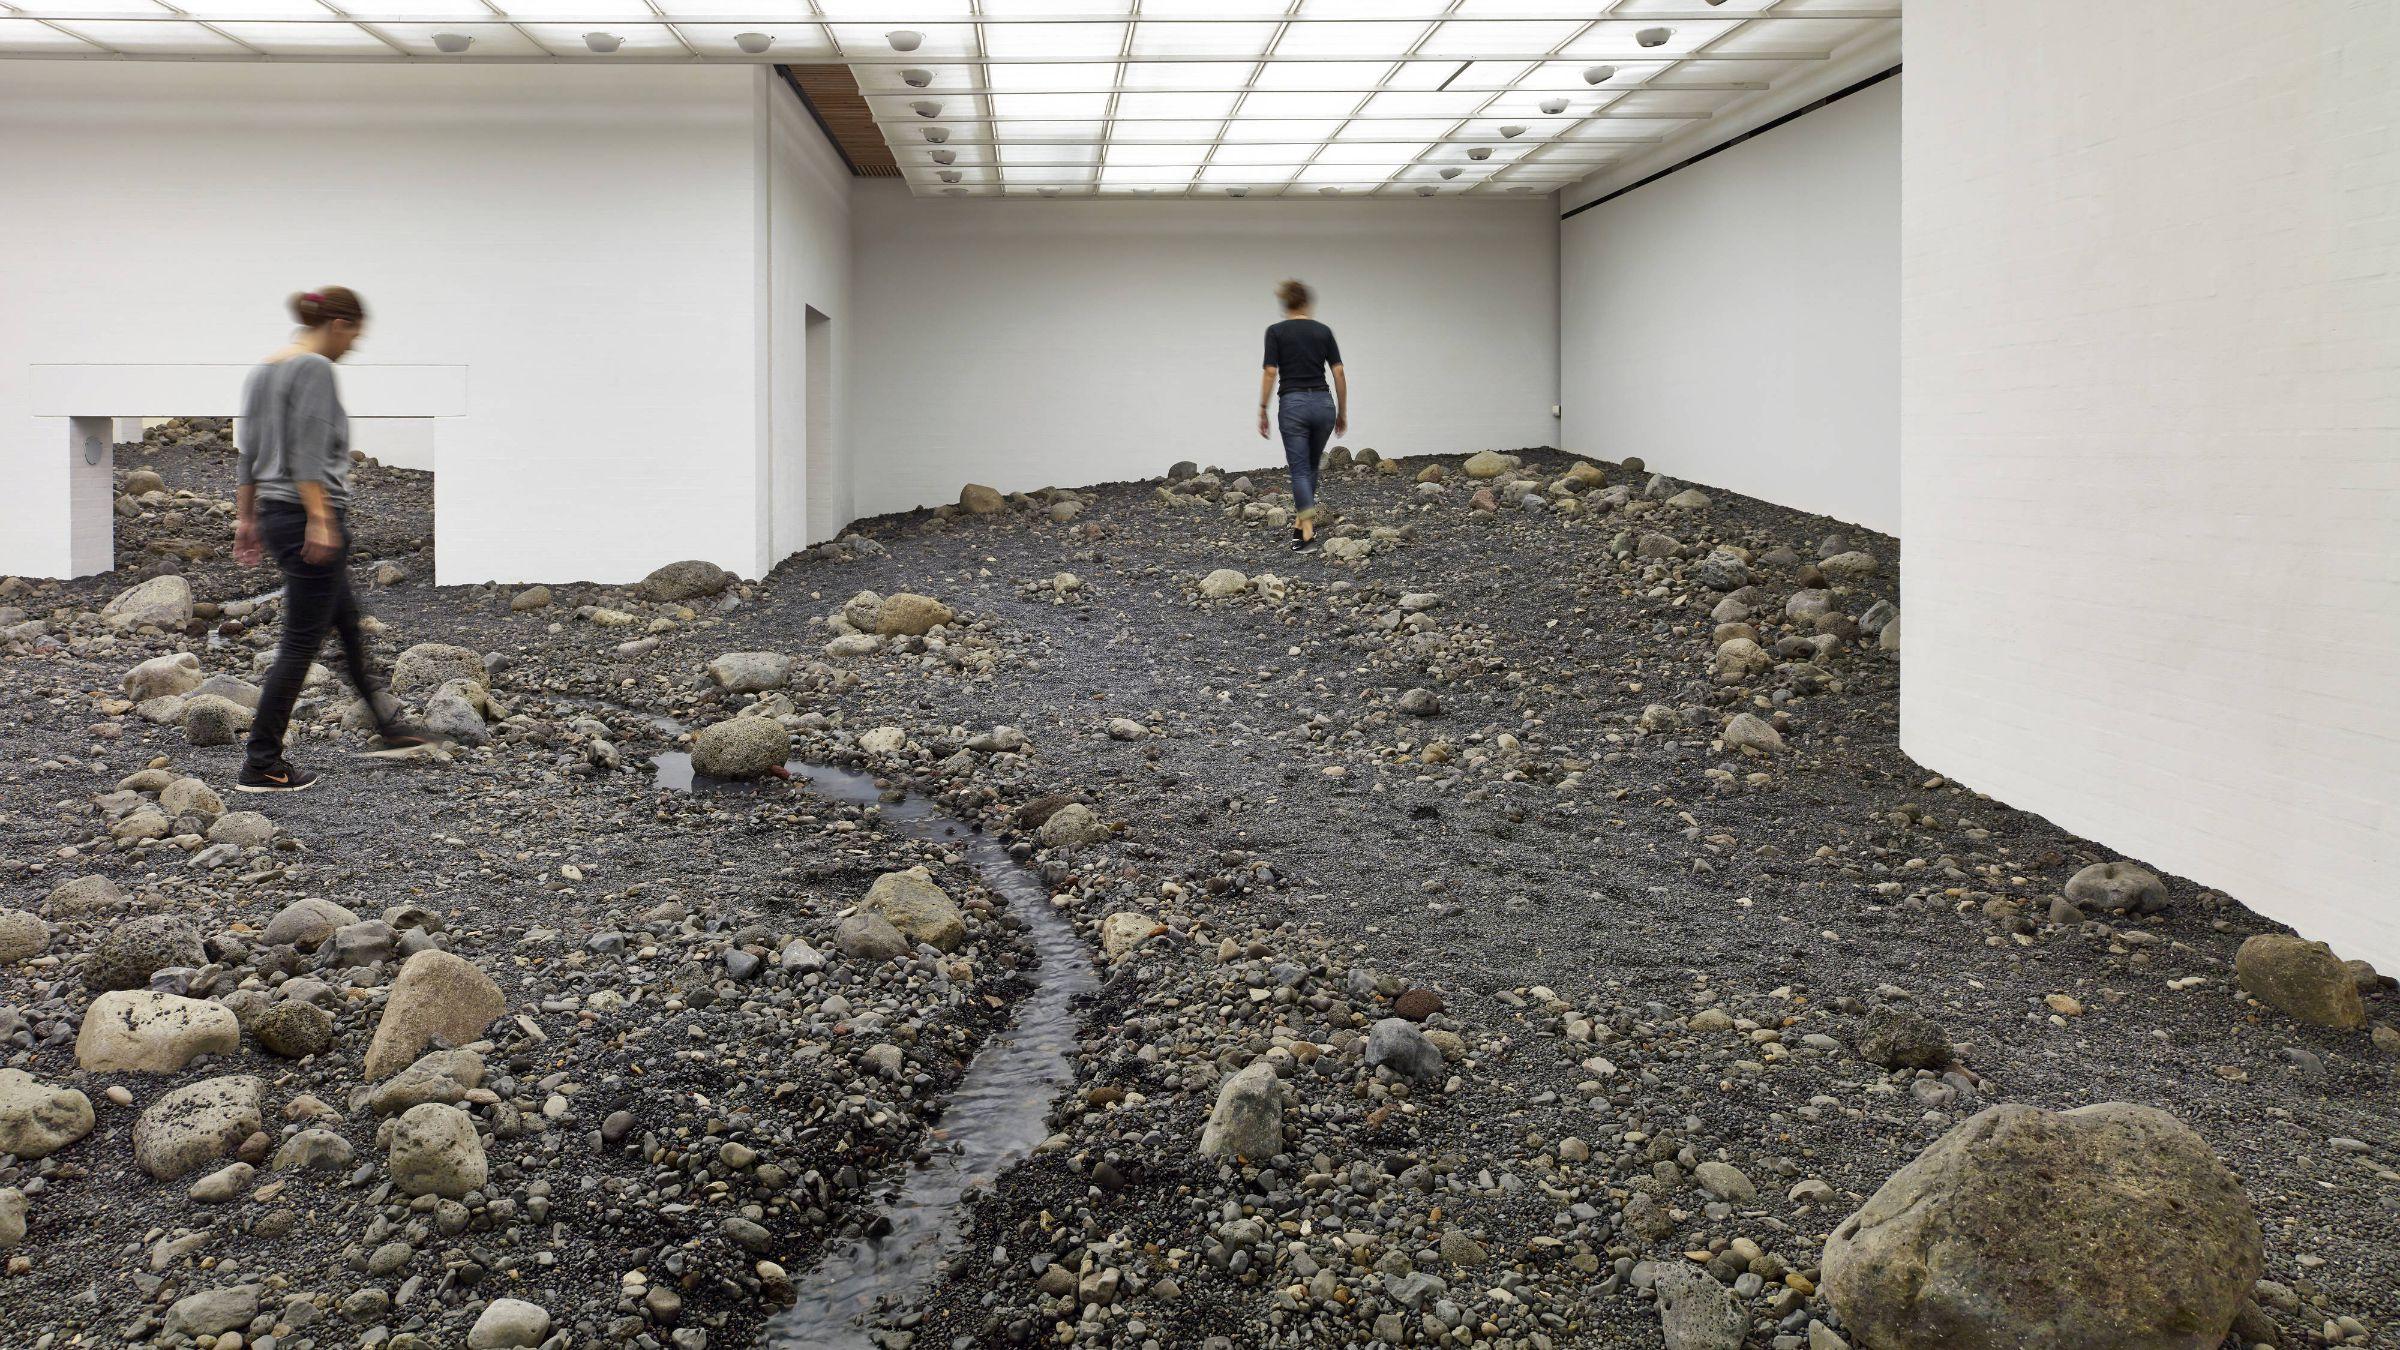 Olafur Eliasson's Riverbed installation at Denmark's Louisiana museum